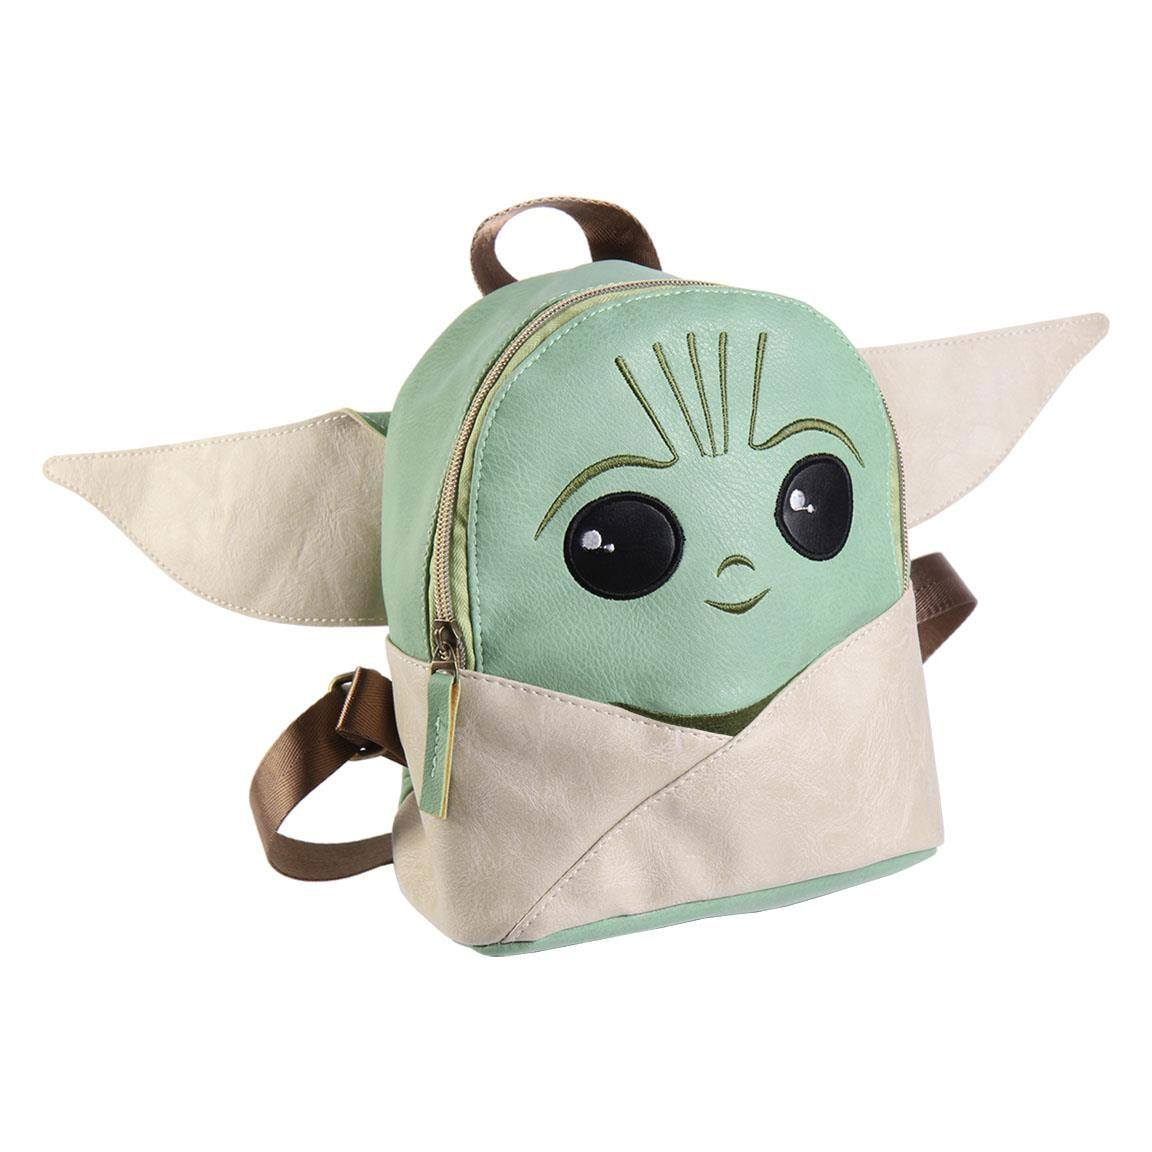 Star Wars The Mandalorian Faux Leather Backpack Grogu